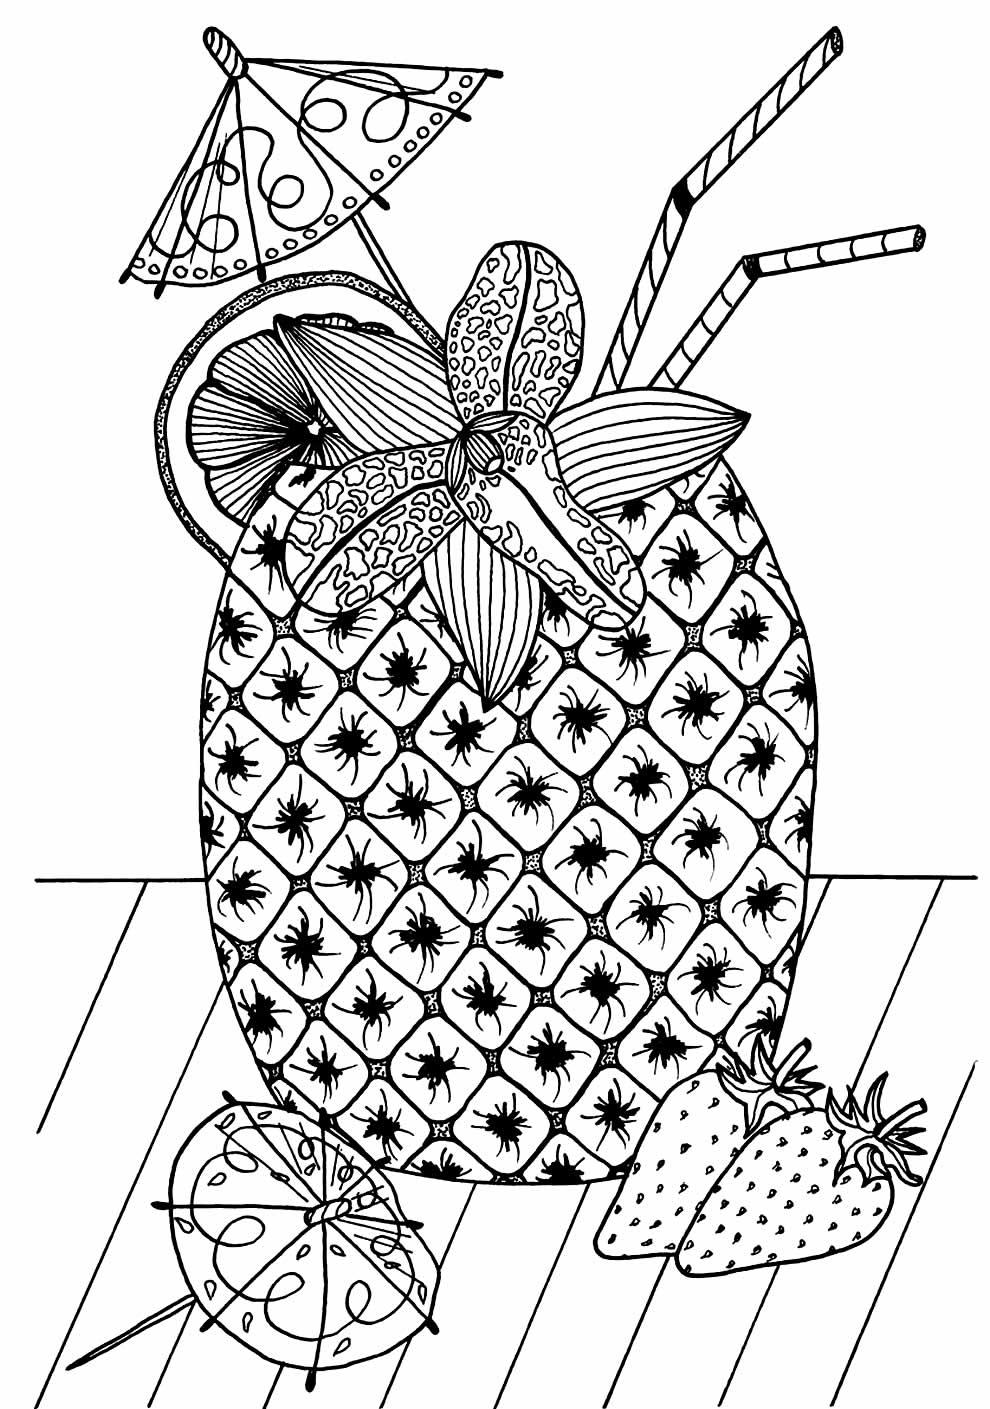 Desenho de abacaxi para imprimir e colorir